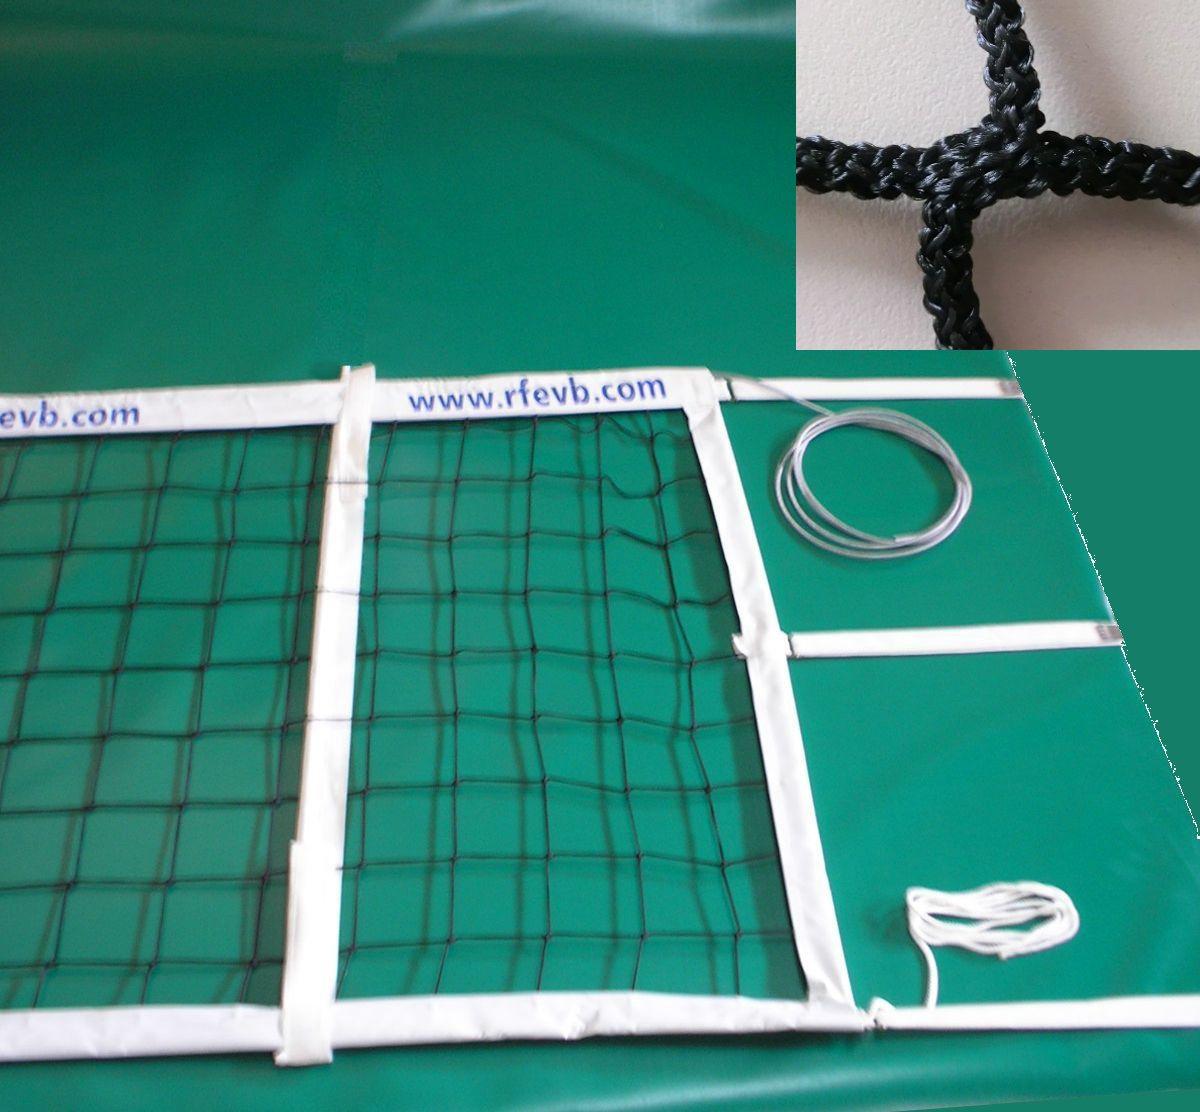 Voleibol modelo competición oficial polipropileno sin nudos 4 mm Redes Deportivas On Line